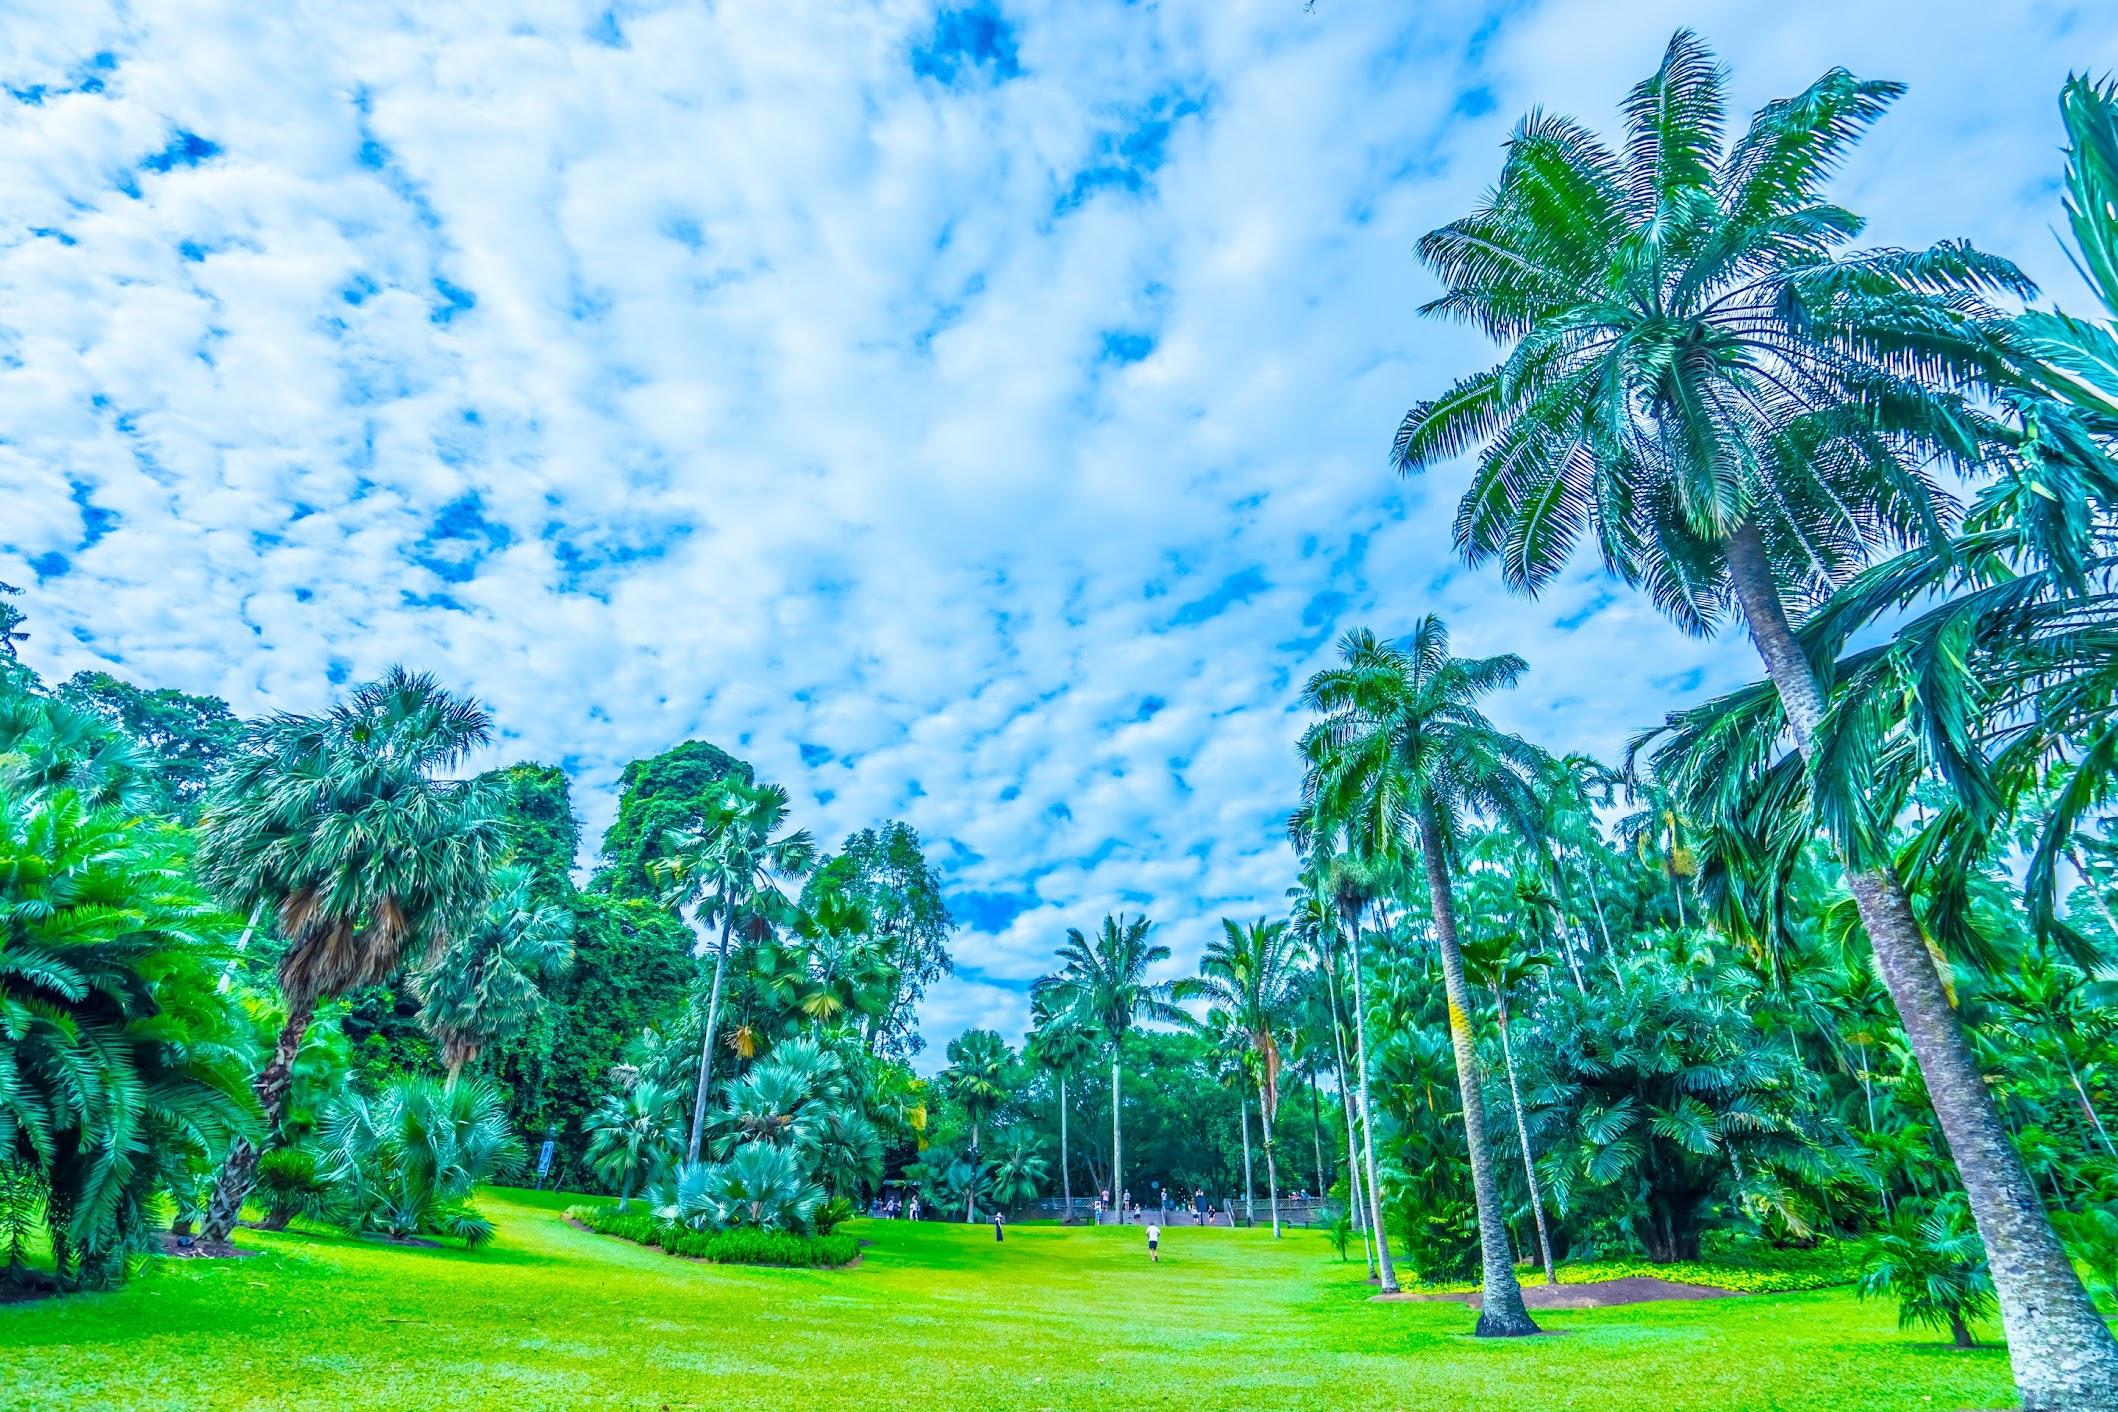 Singapore Botanic Gardens Palm Valley2